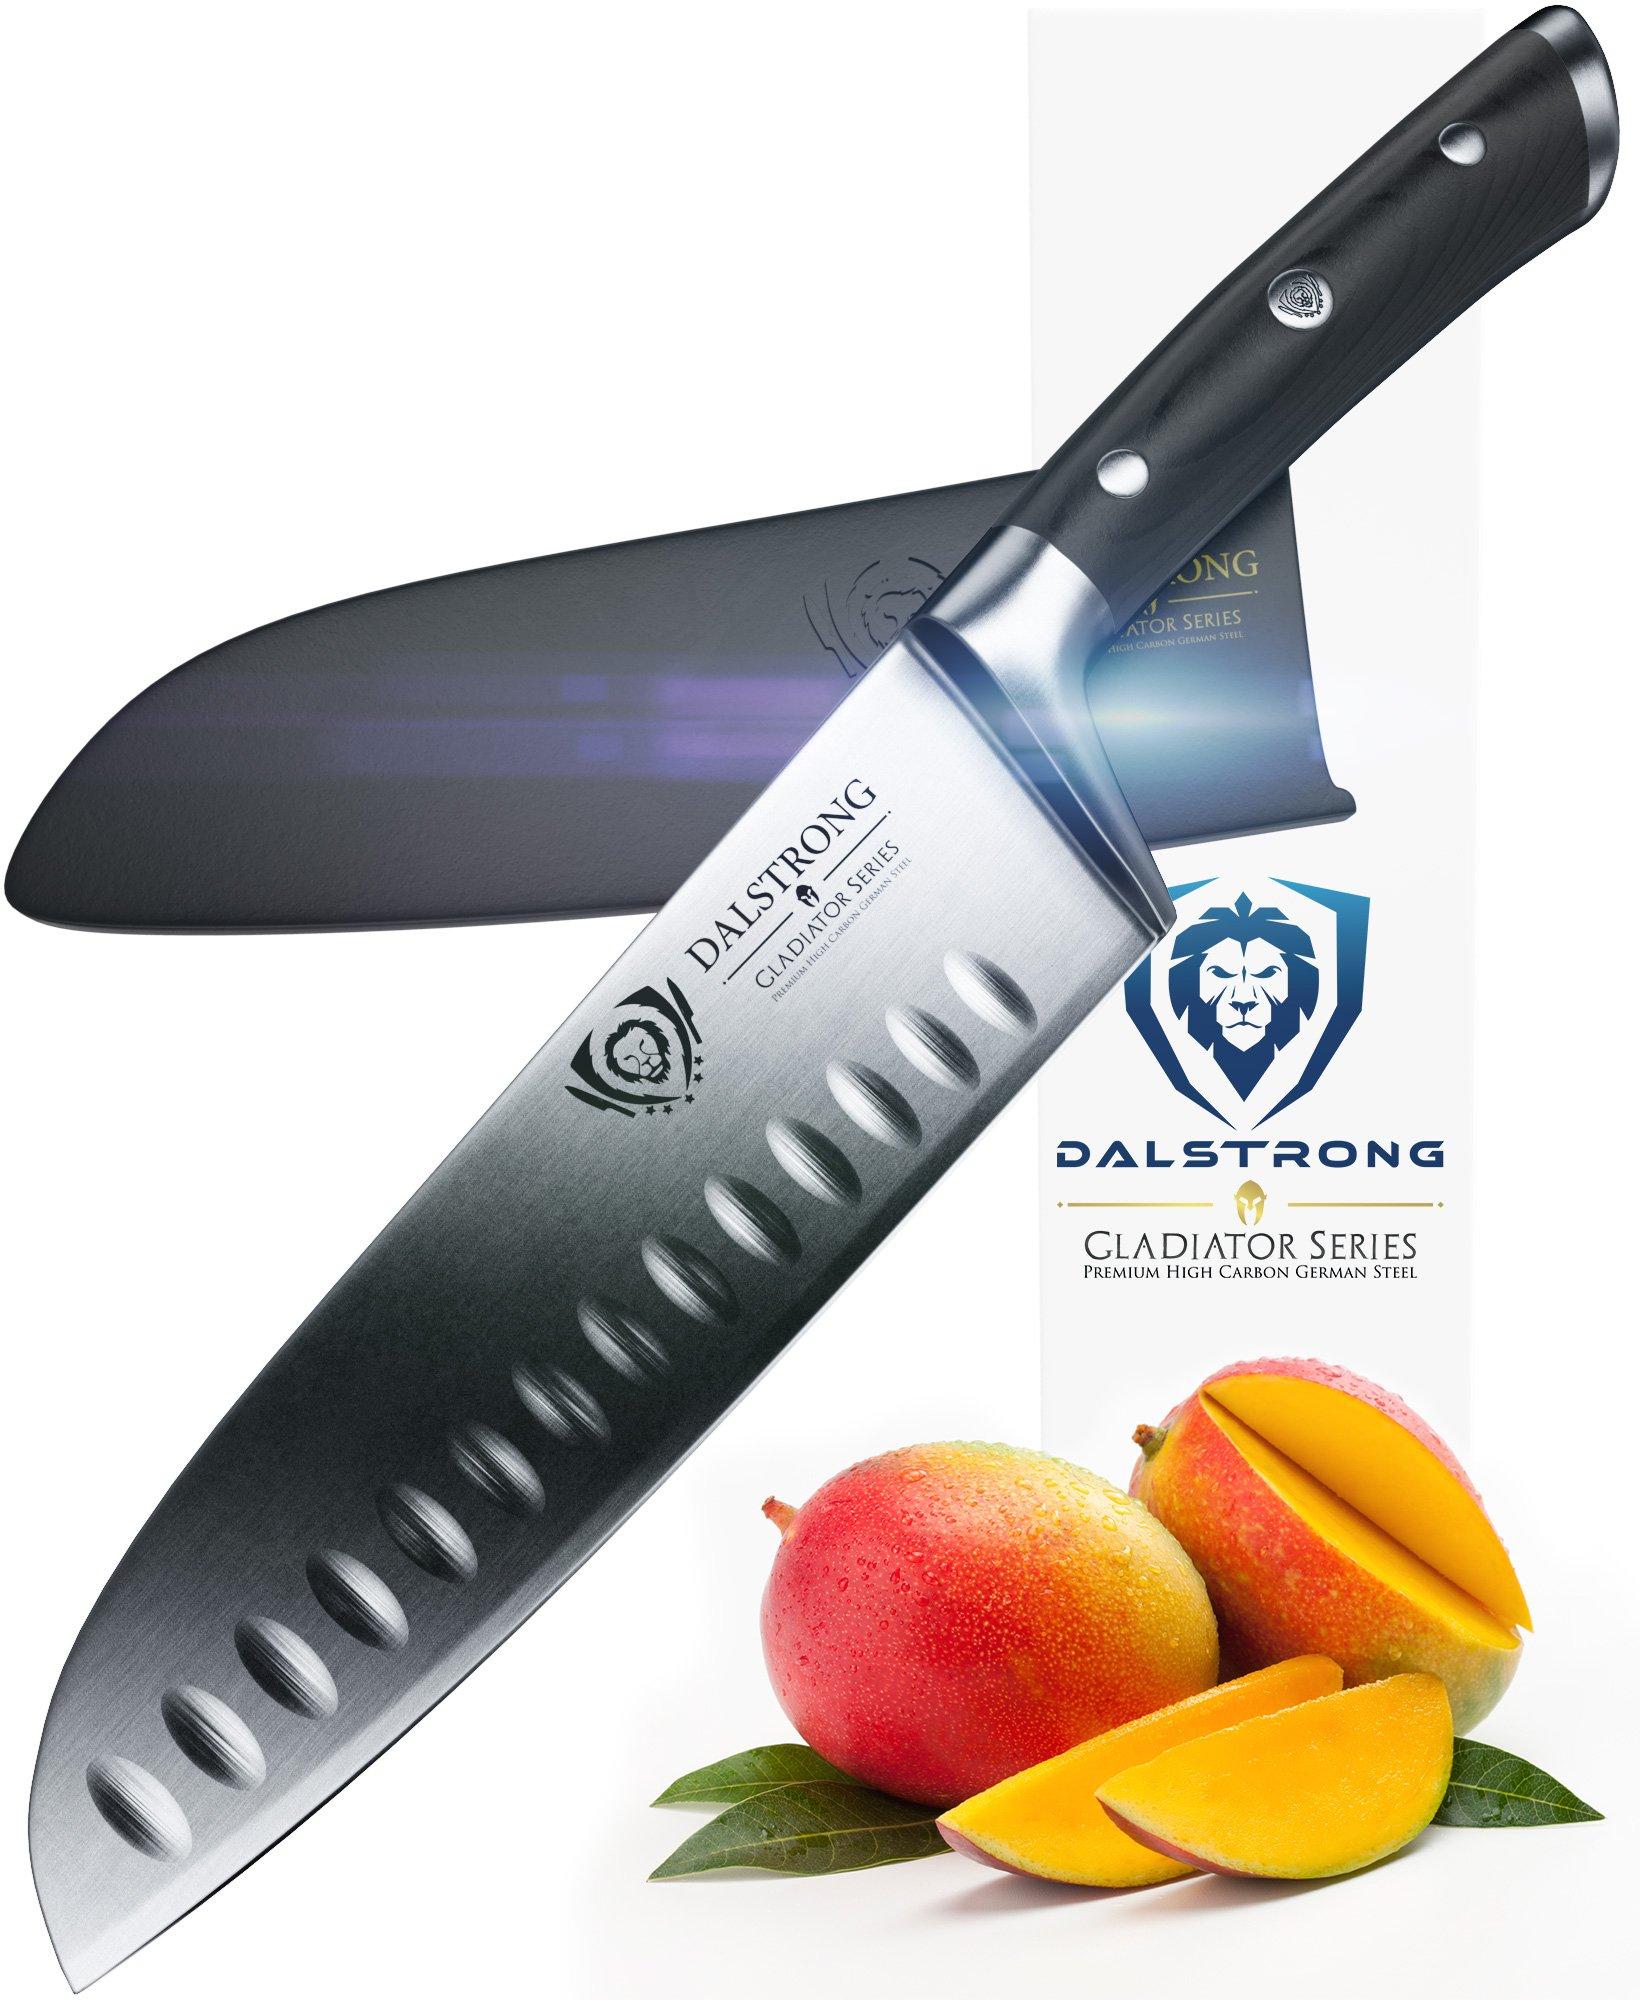 DALSTRONG Santoku Knife - Gladiator Series - German HC Steel - 7'' (180mm)